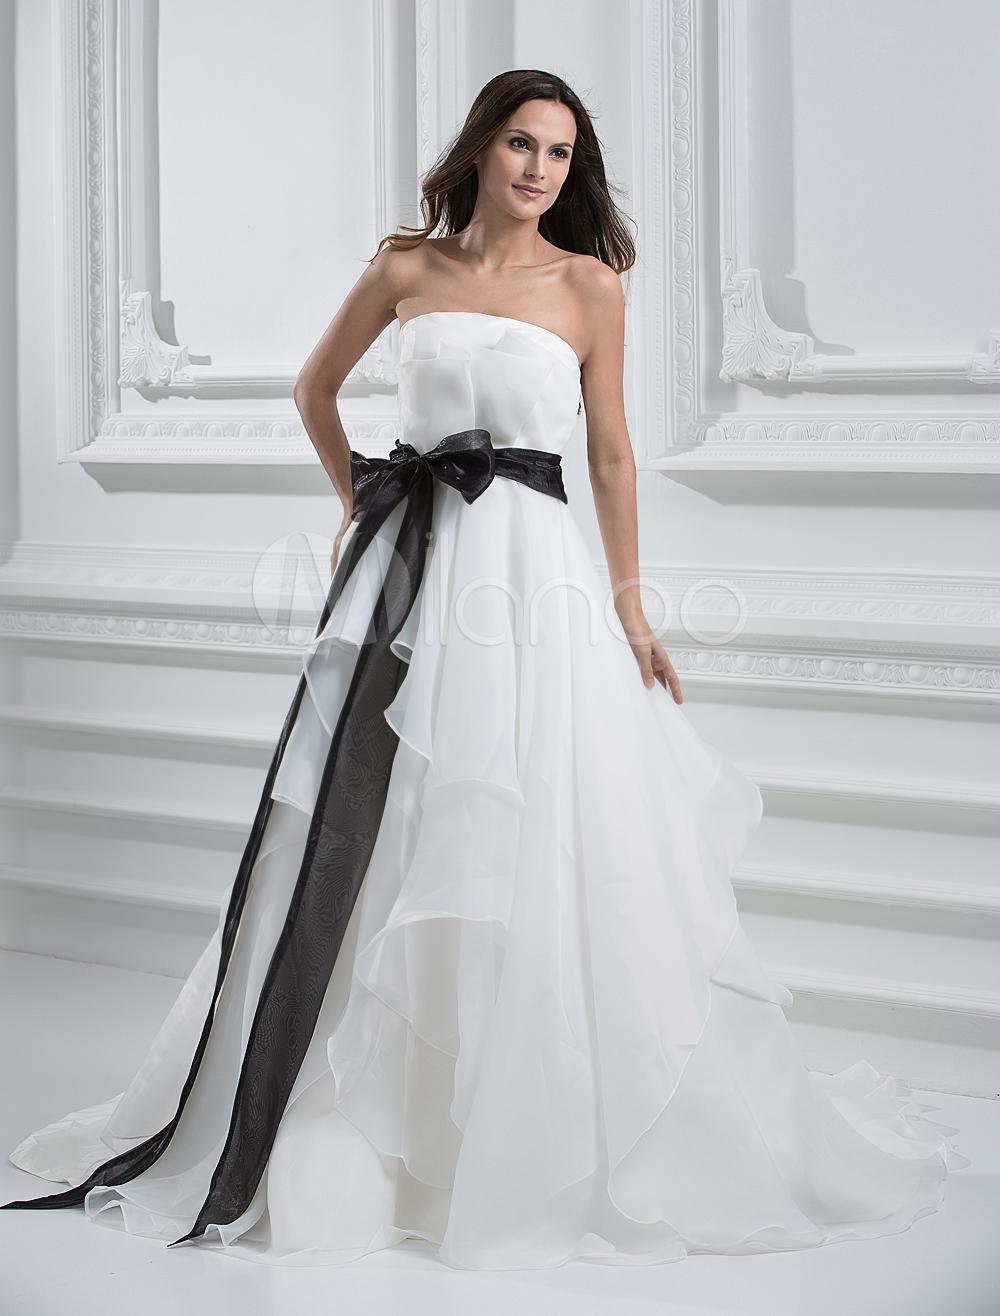 bbw wedding dresses photo - 1